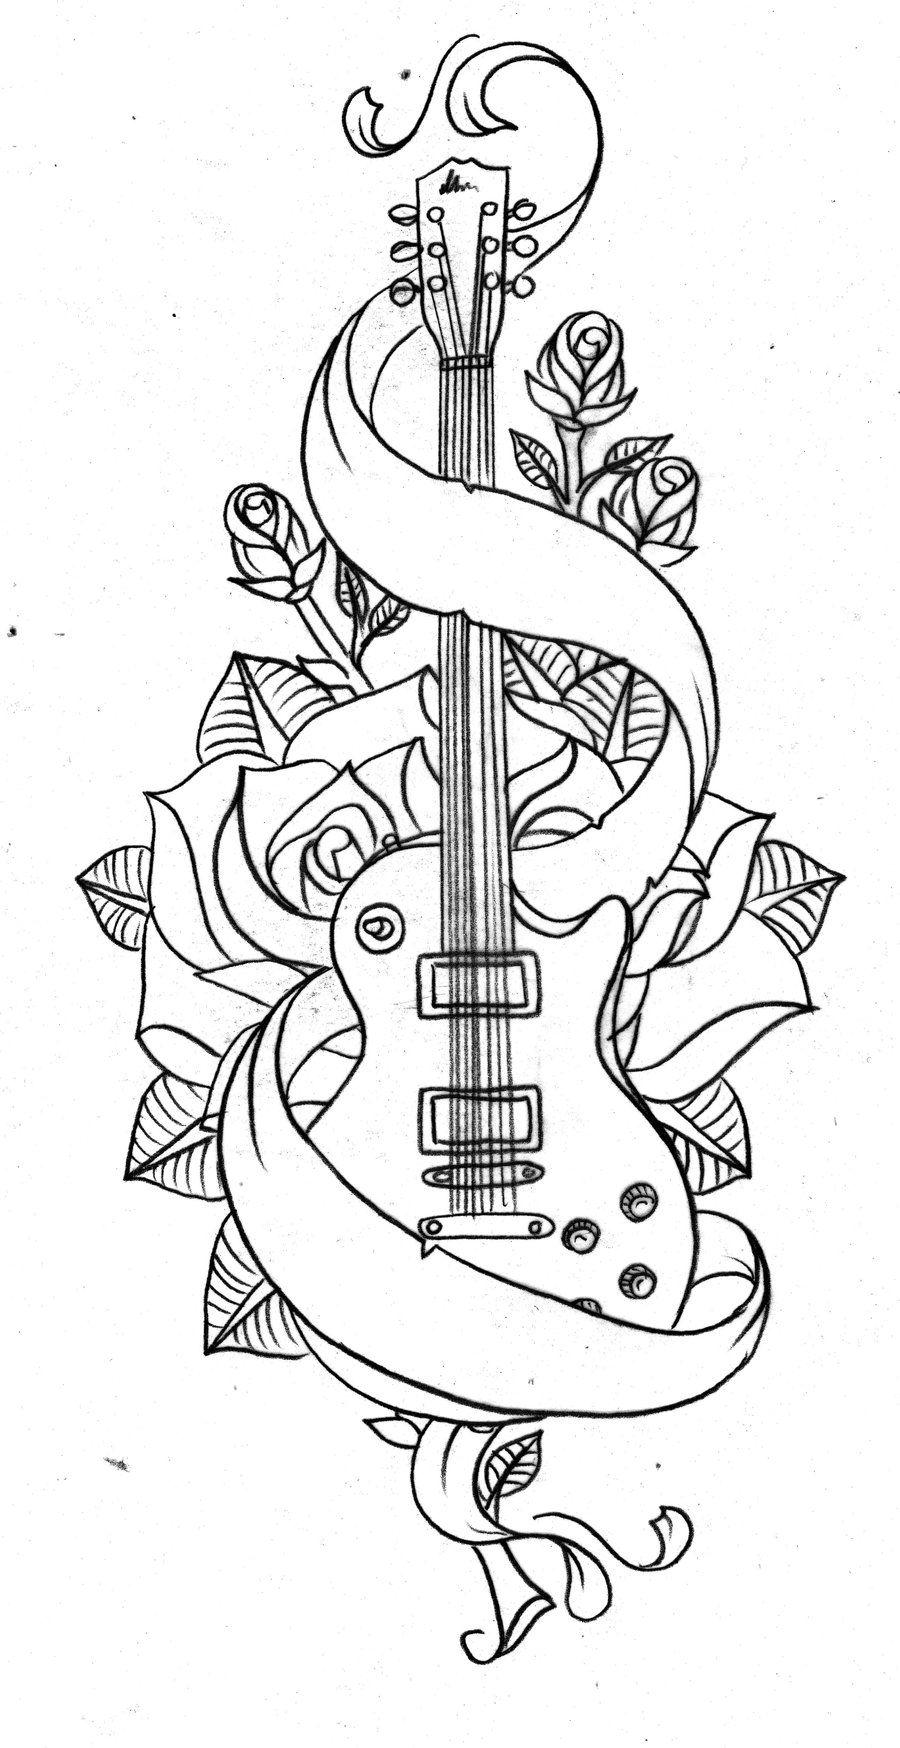 Pin de Rúbia Milena M. Pissinatti en Desenhos para colorir ...